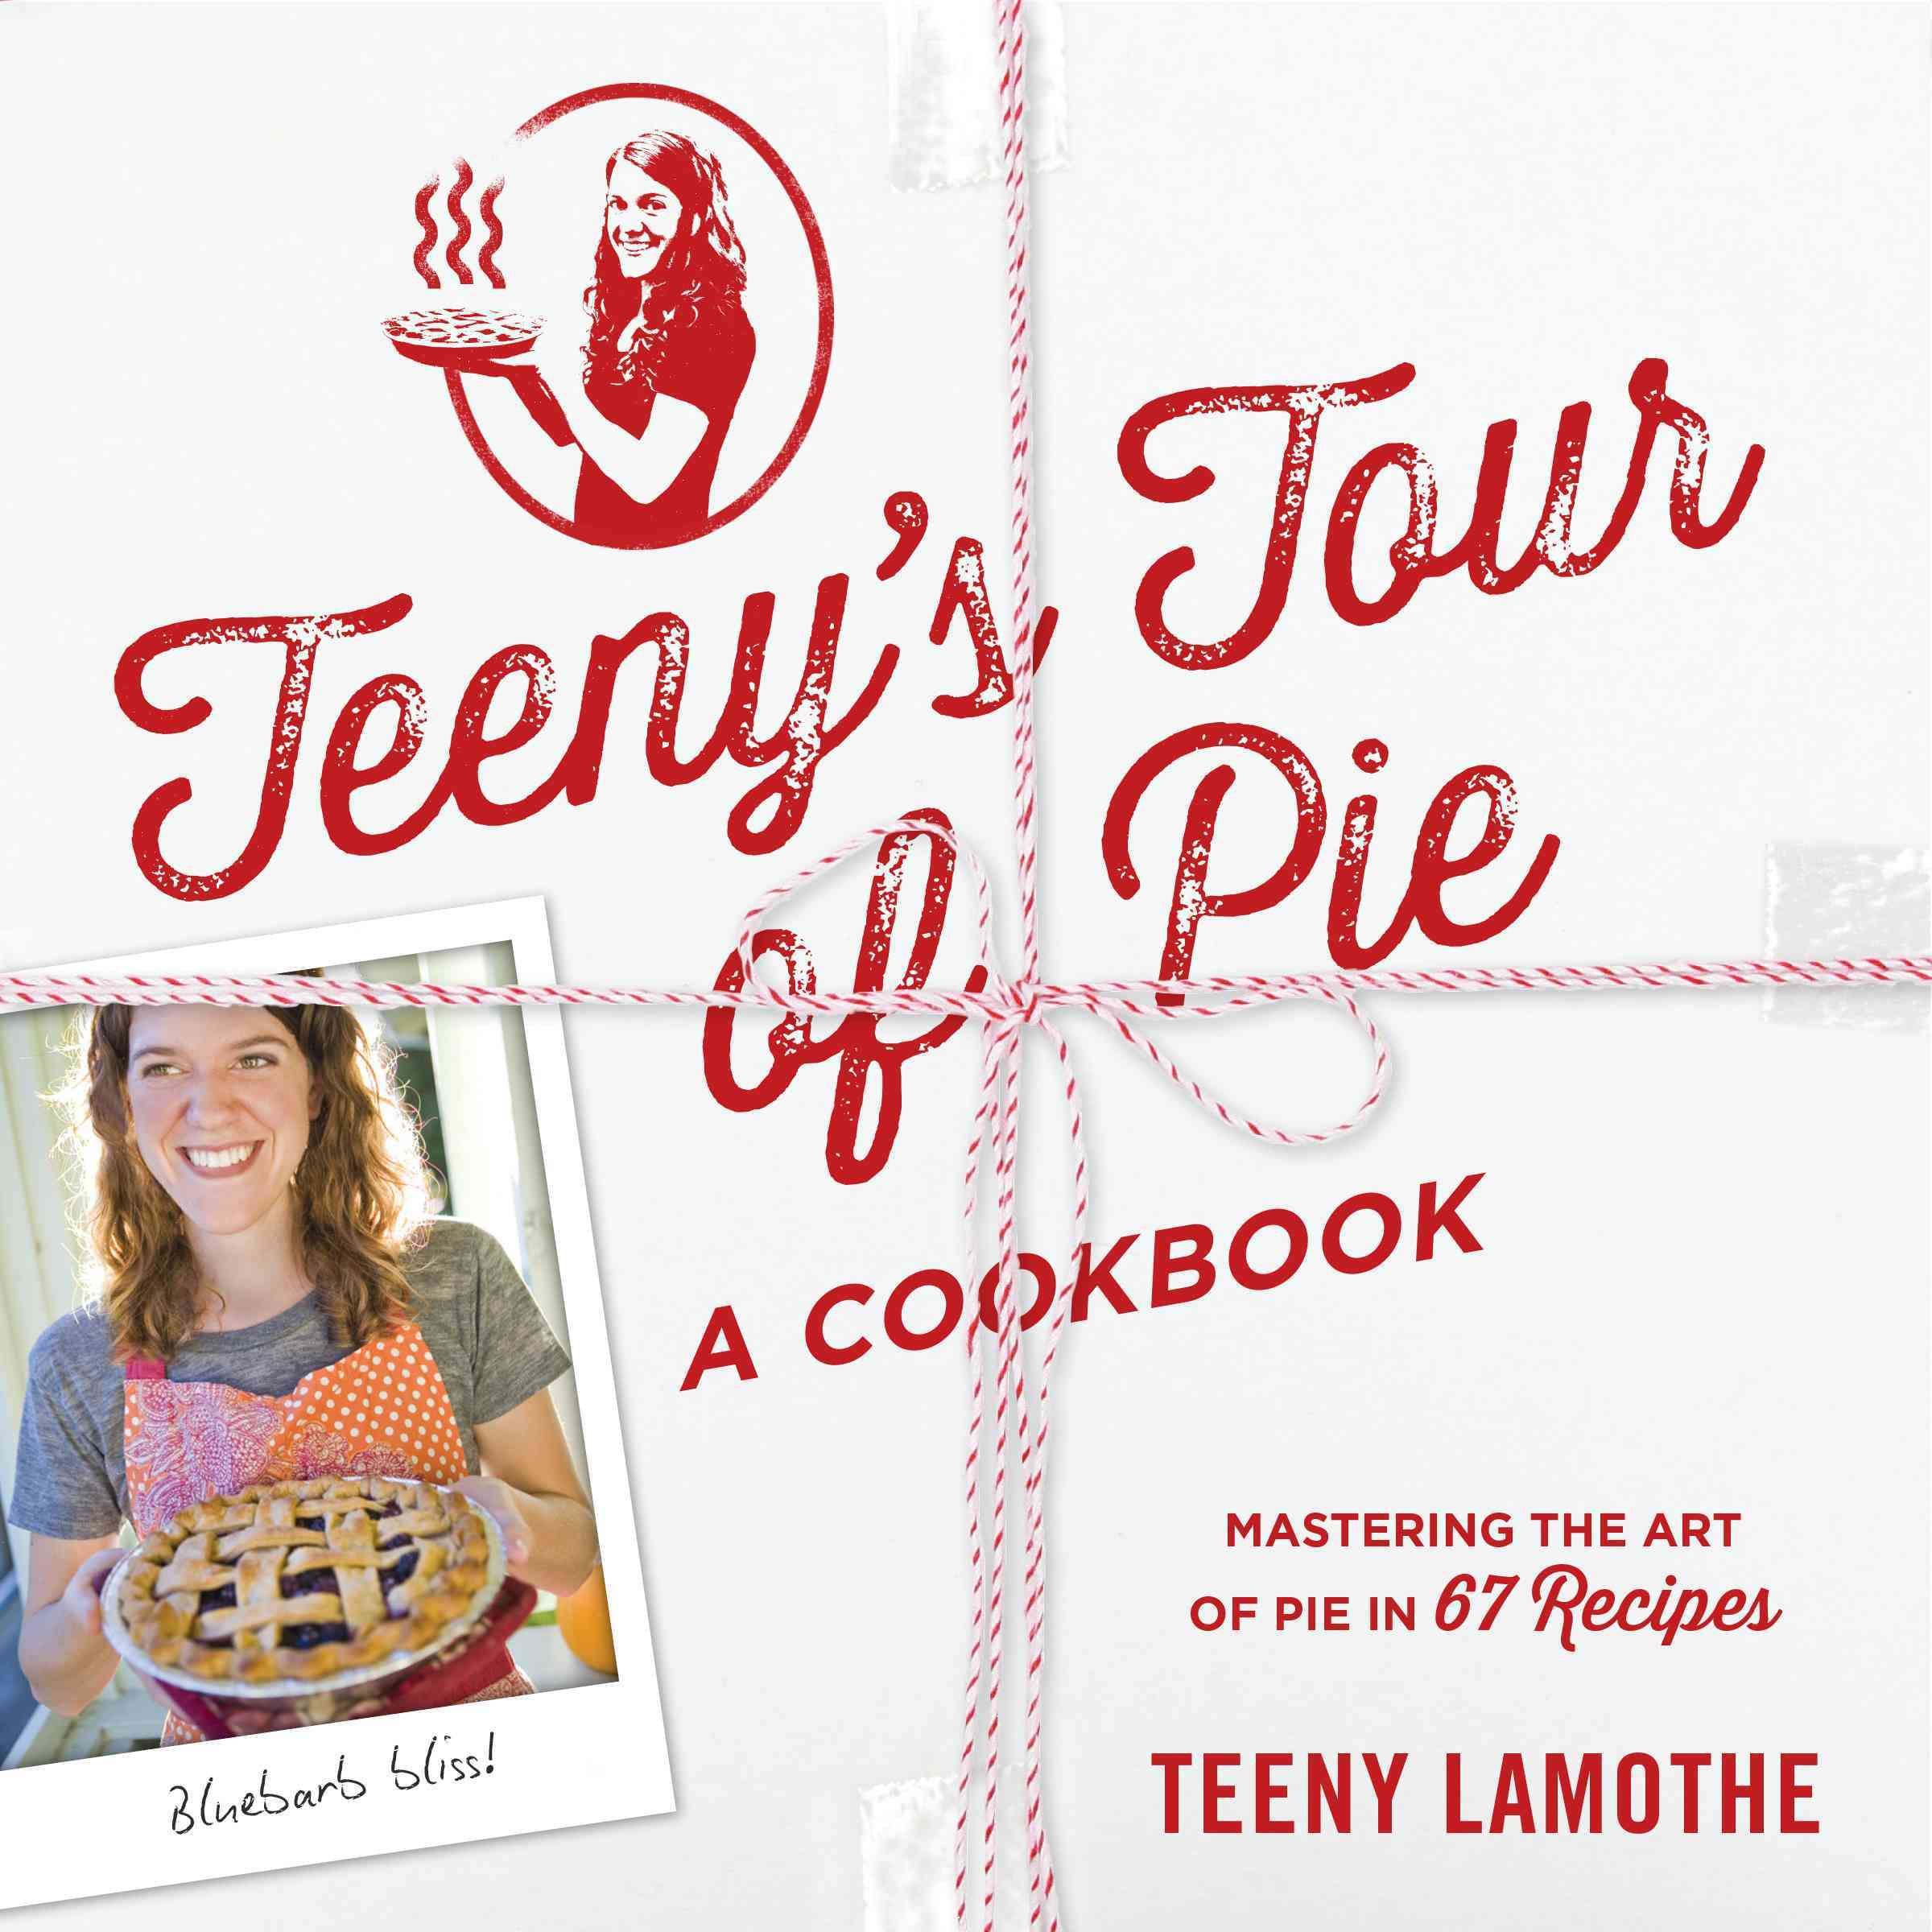 Teeny's Tour of Pie By Lamothe, Teeny